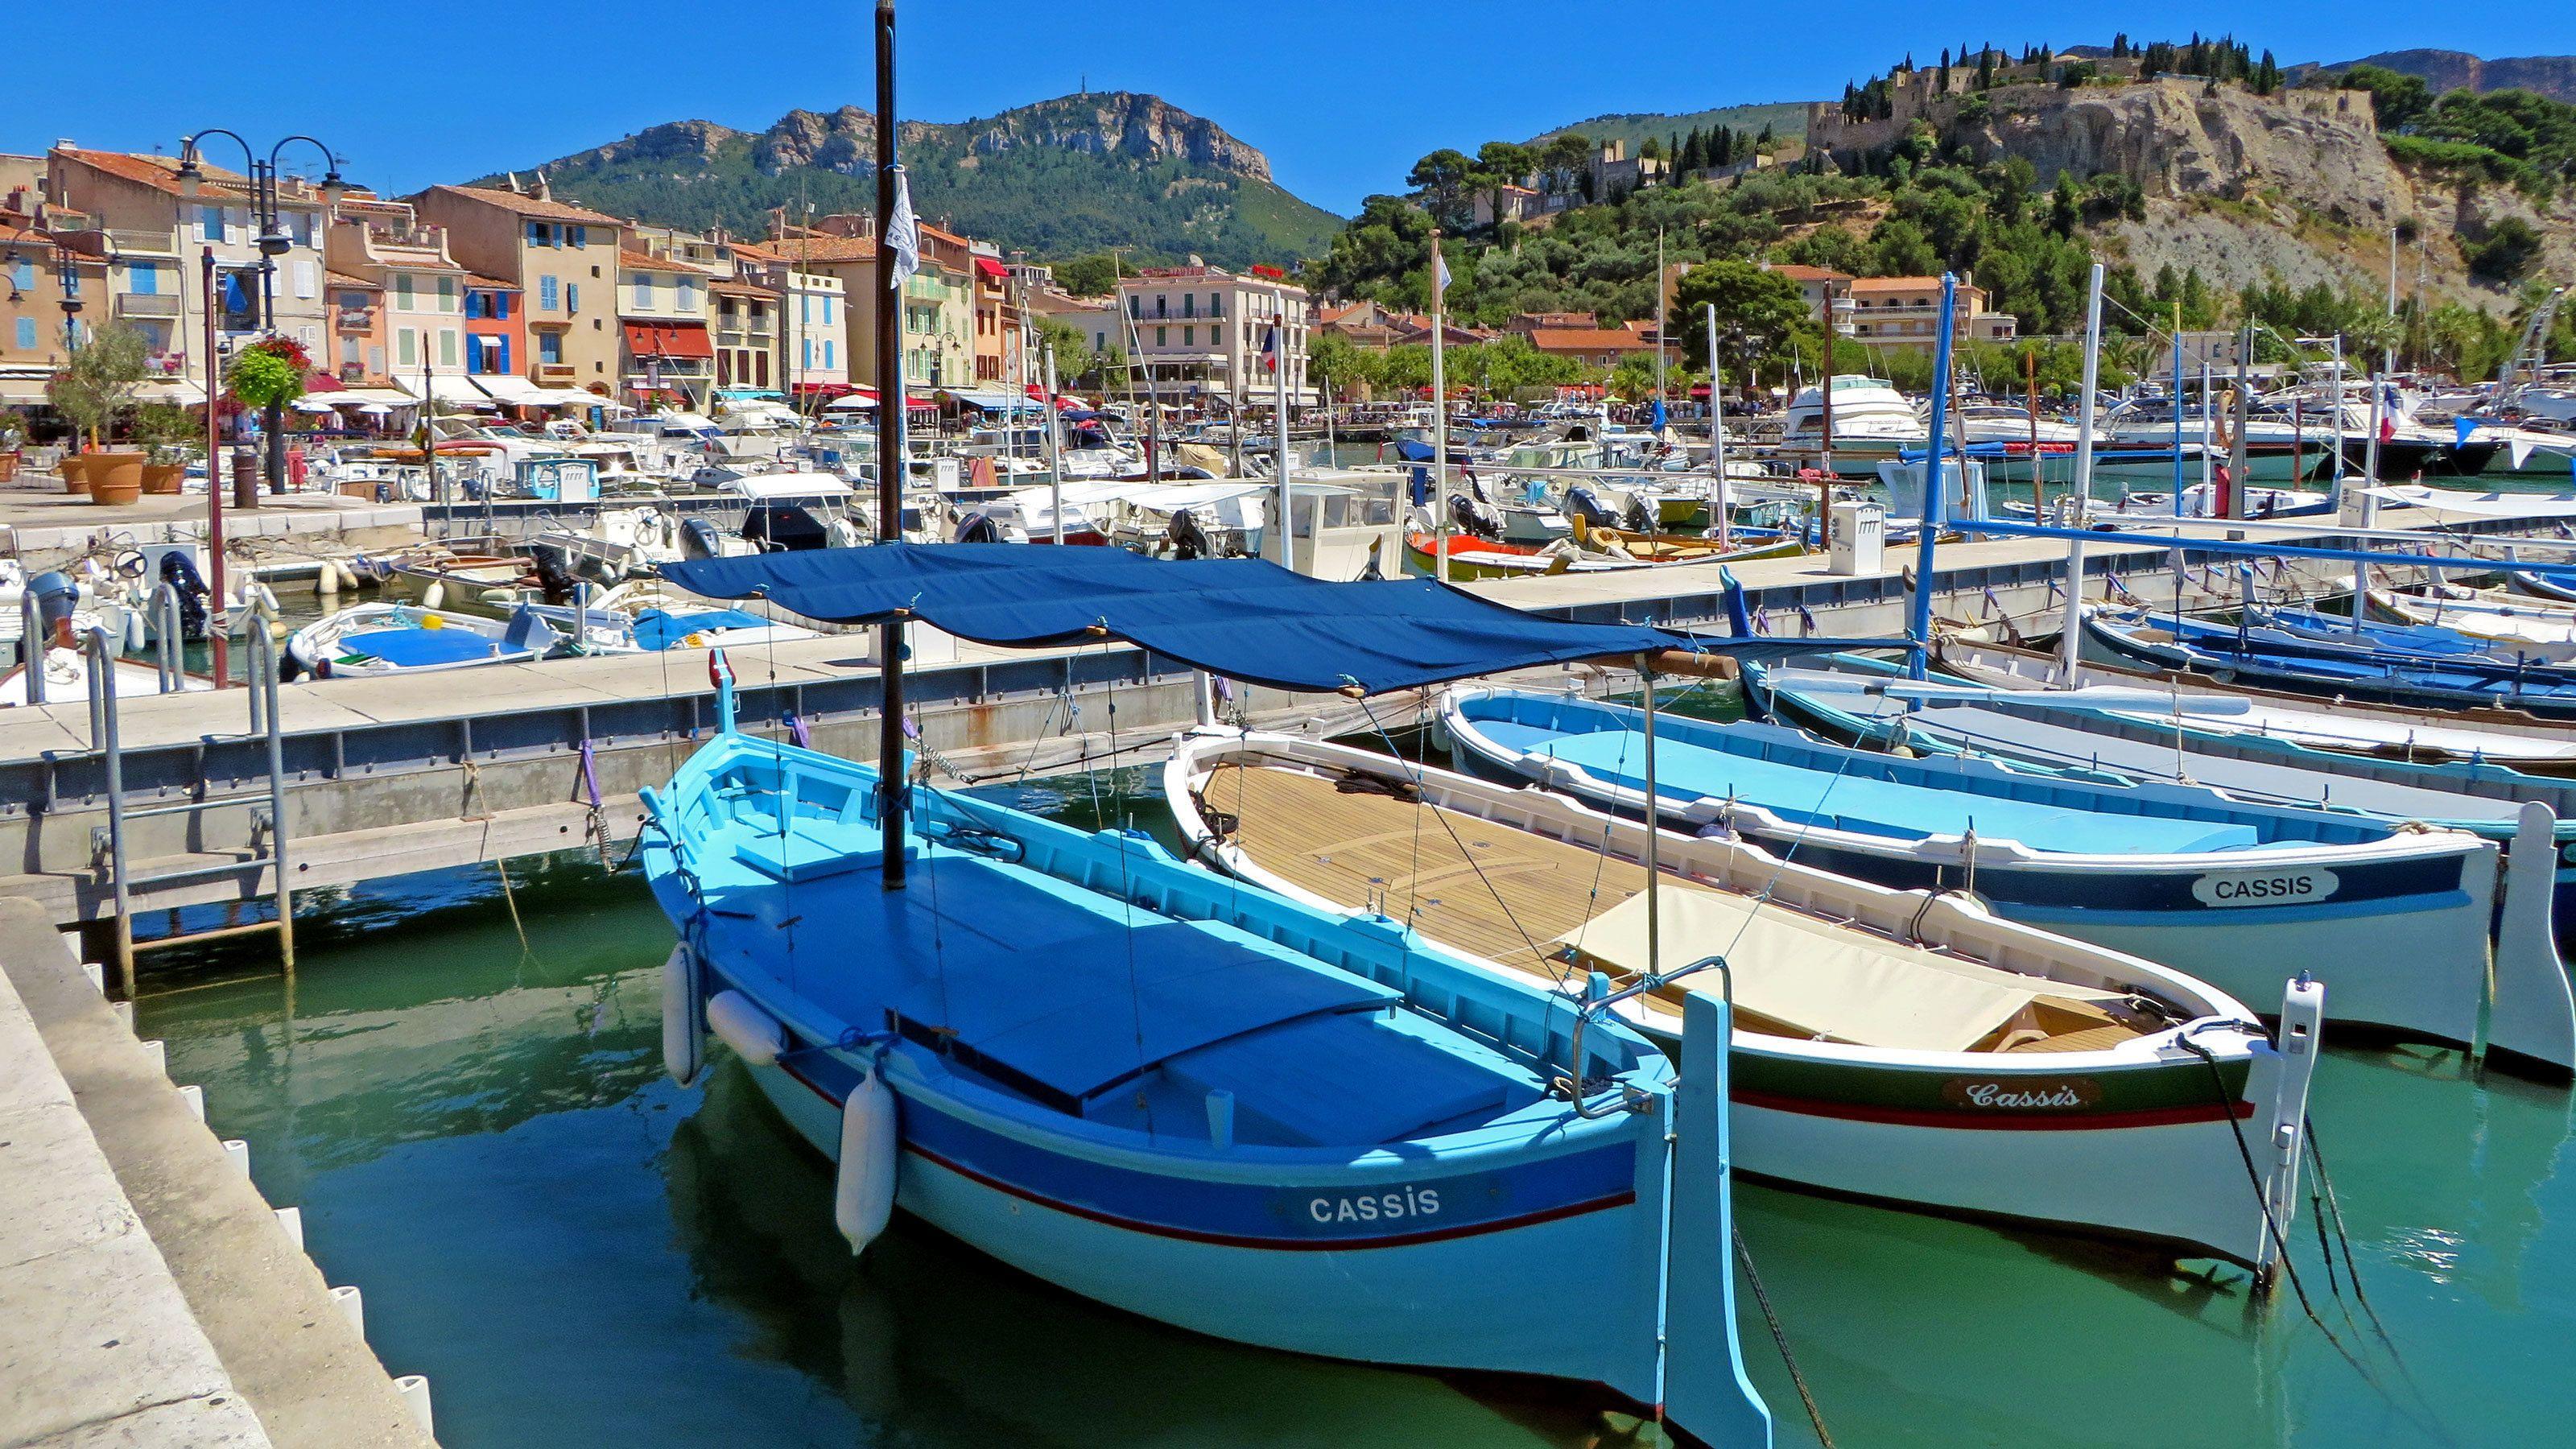 boat docked in Marseille